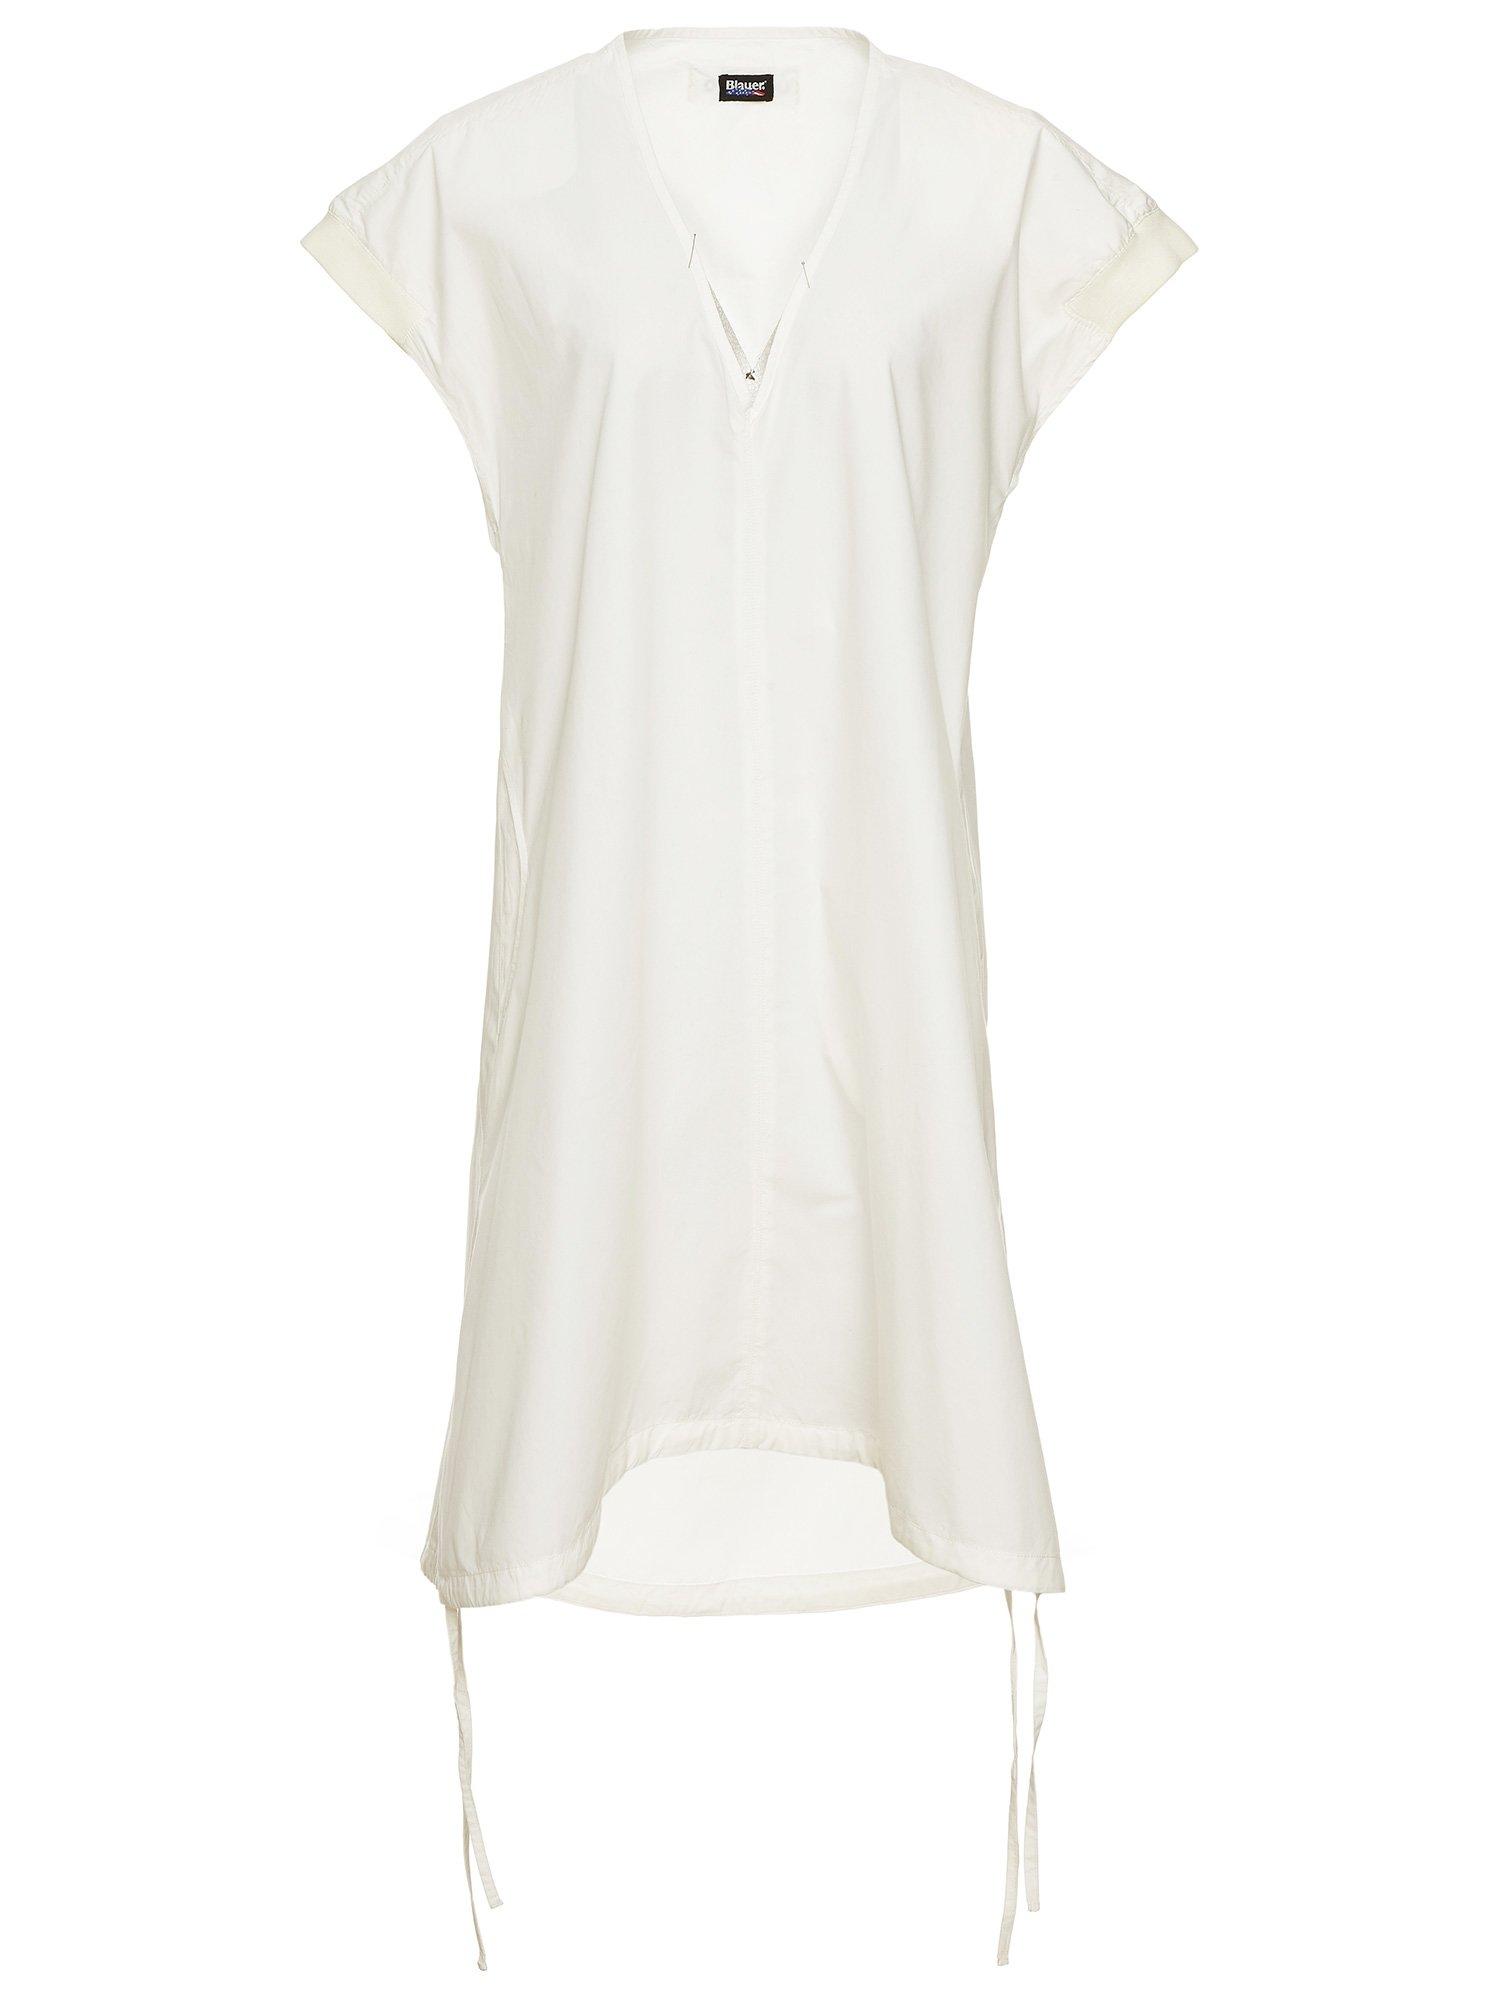 COTTON POPLIN SLEEVELESS DRESS - Blauer